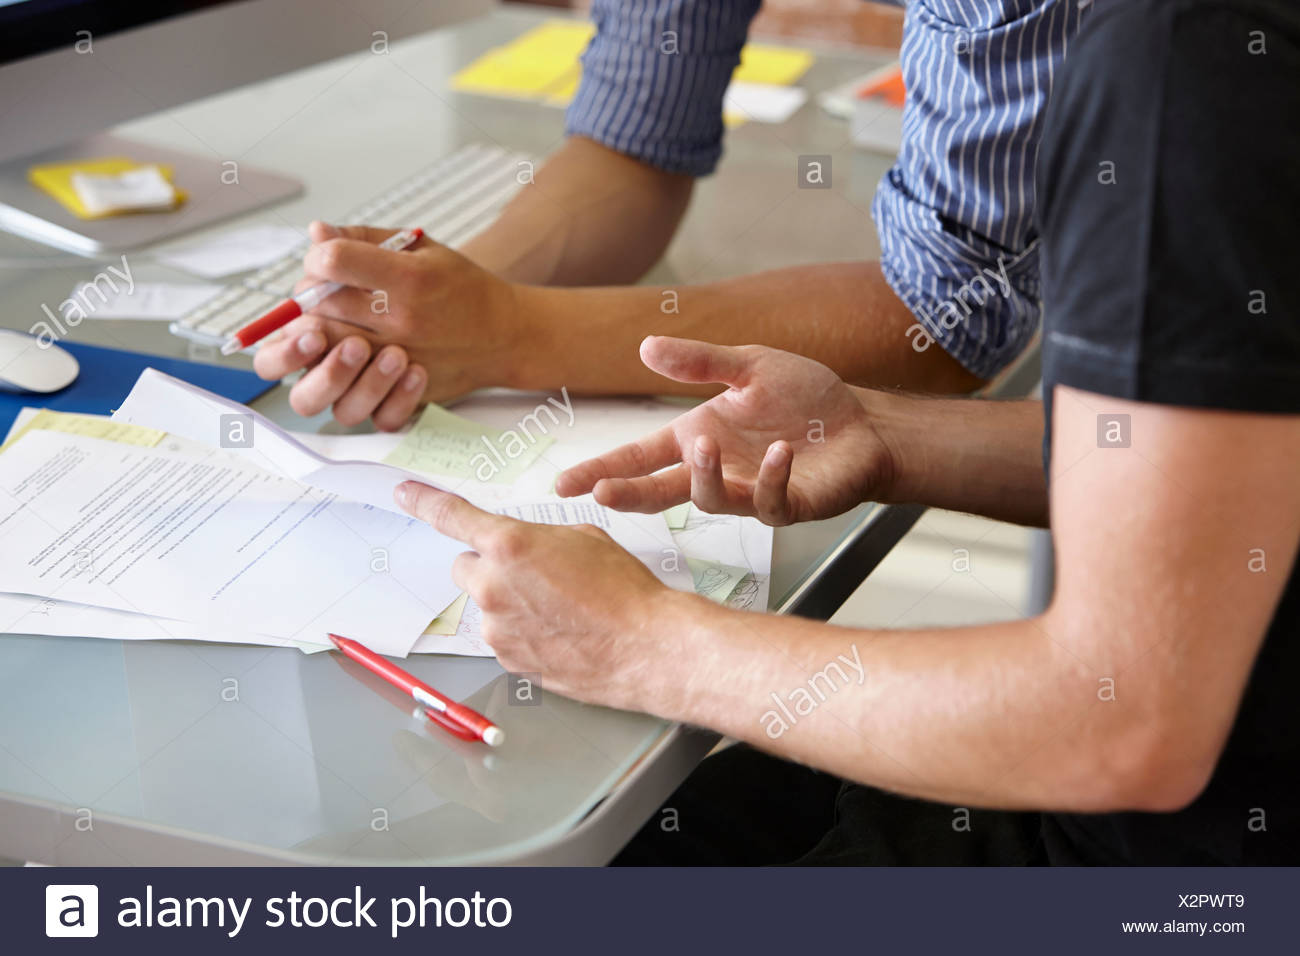 Dos hombres con papeleo, cerrar Imagen De Stock